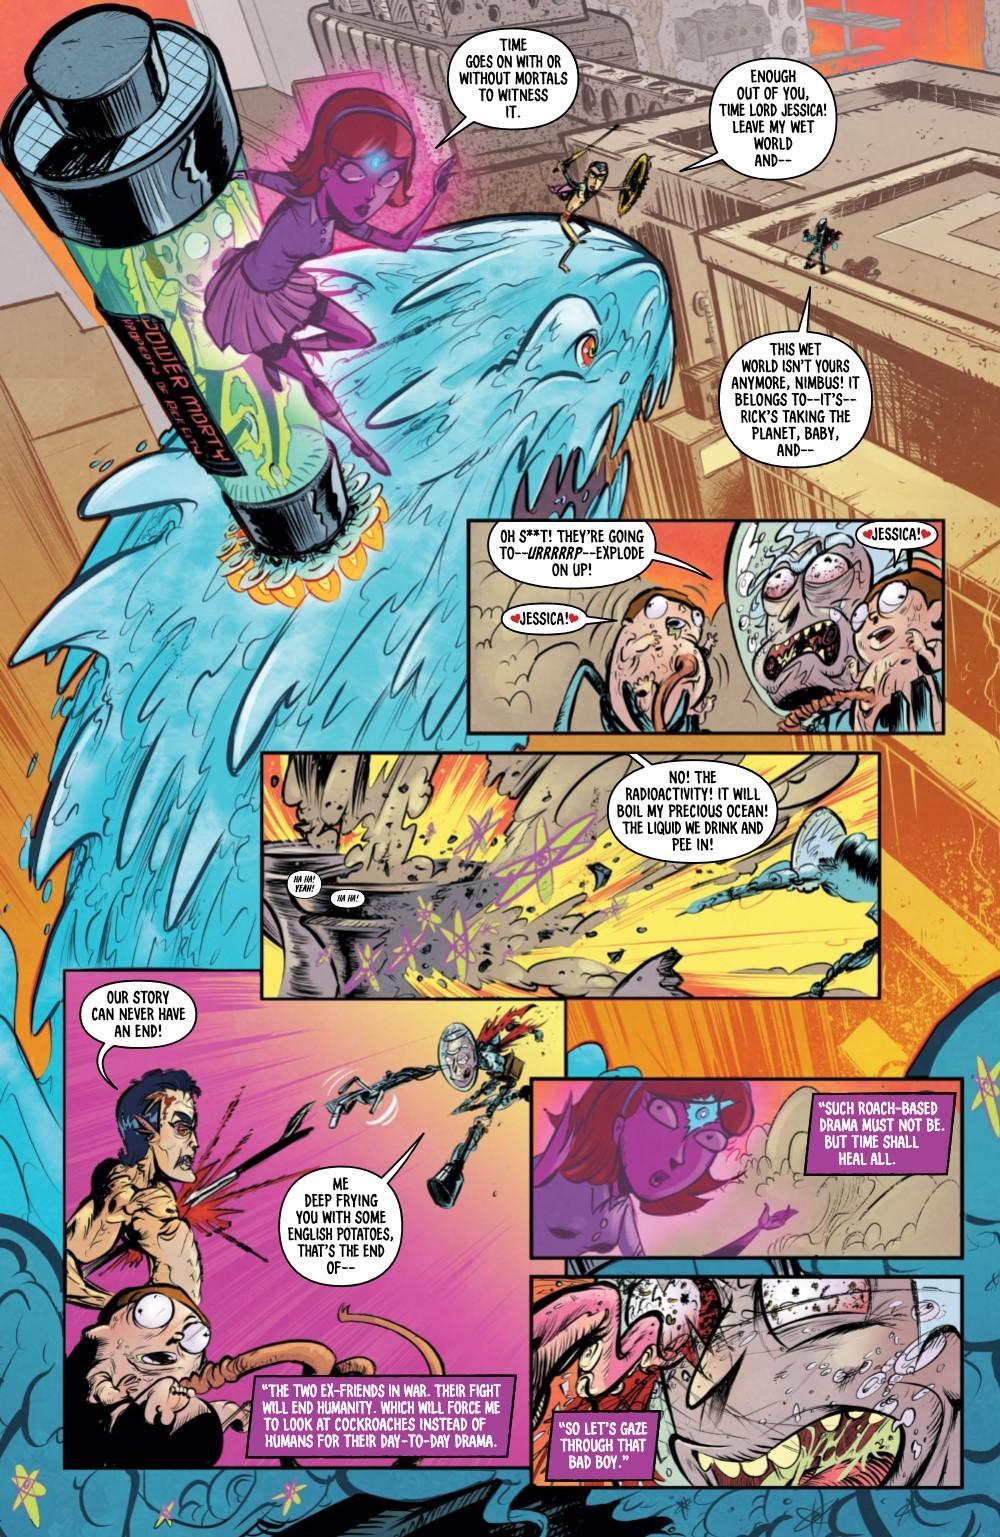 RM-MRNIMBUS-1-REFERENCE-07 ComicList Previews: RICK AND MORTY MR. NIMBUS #1